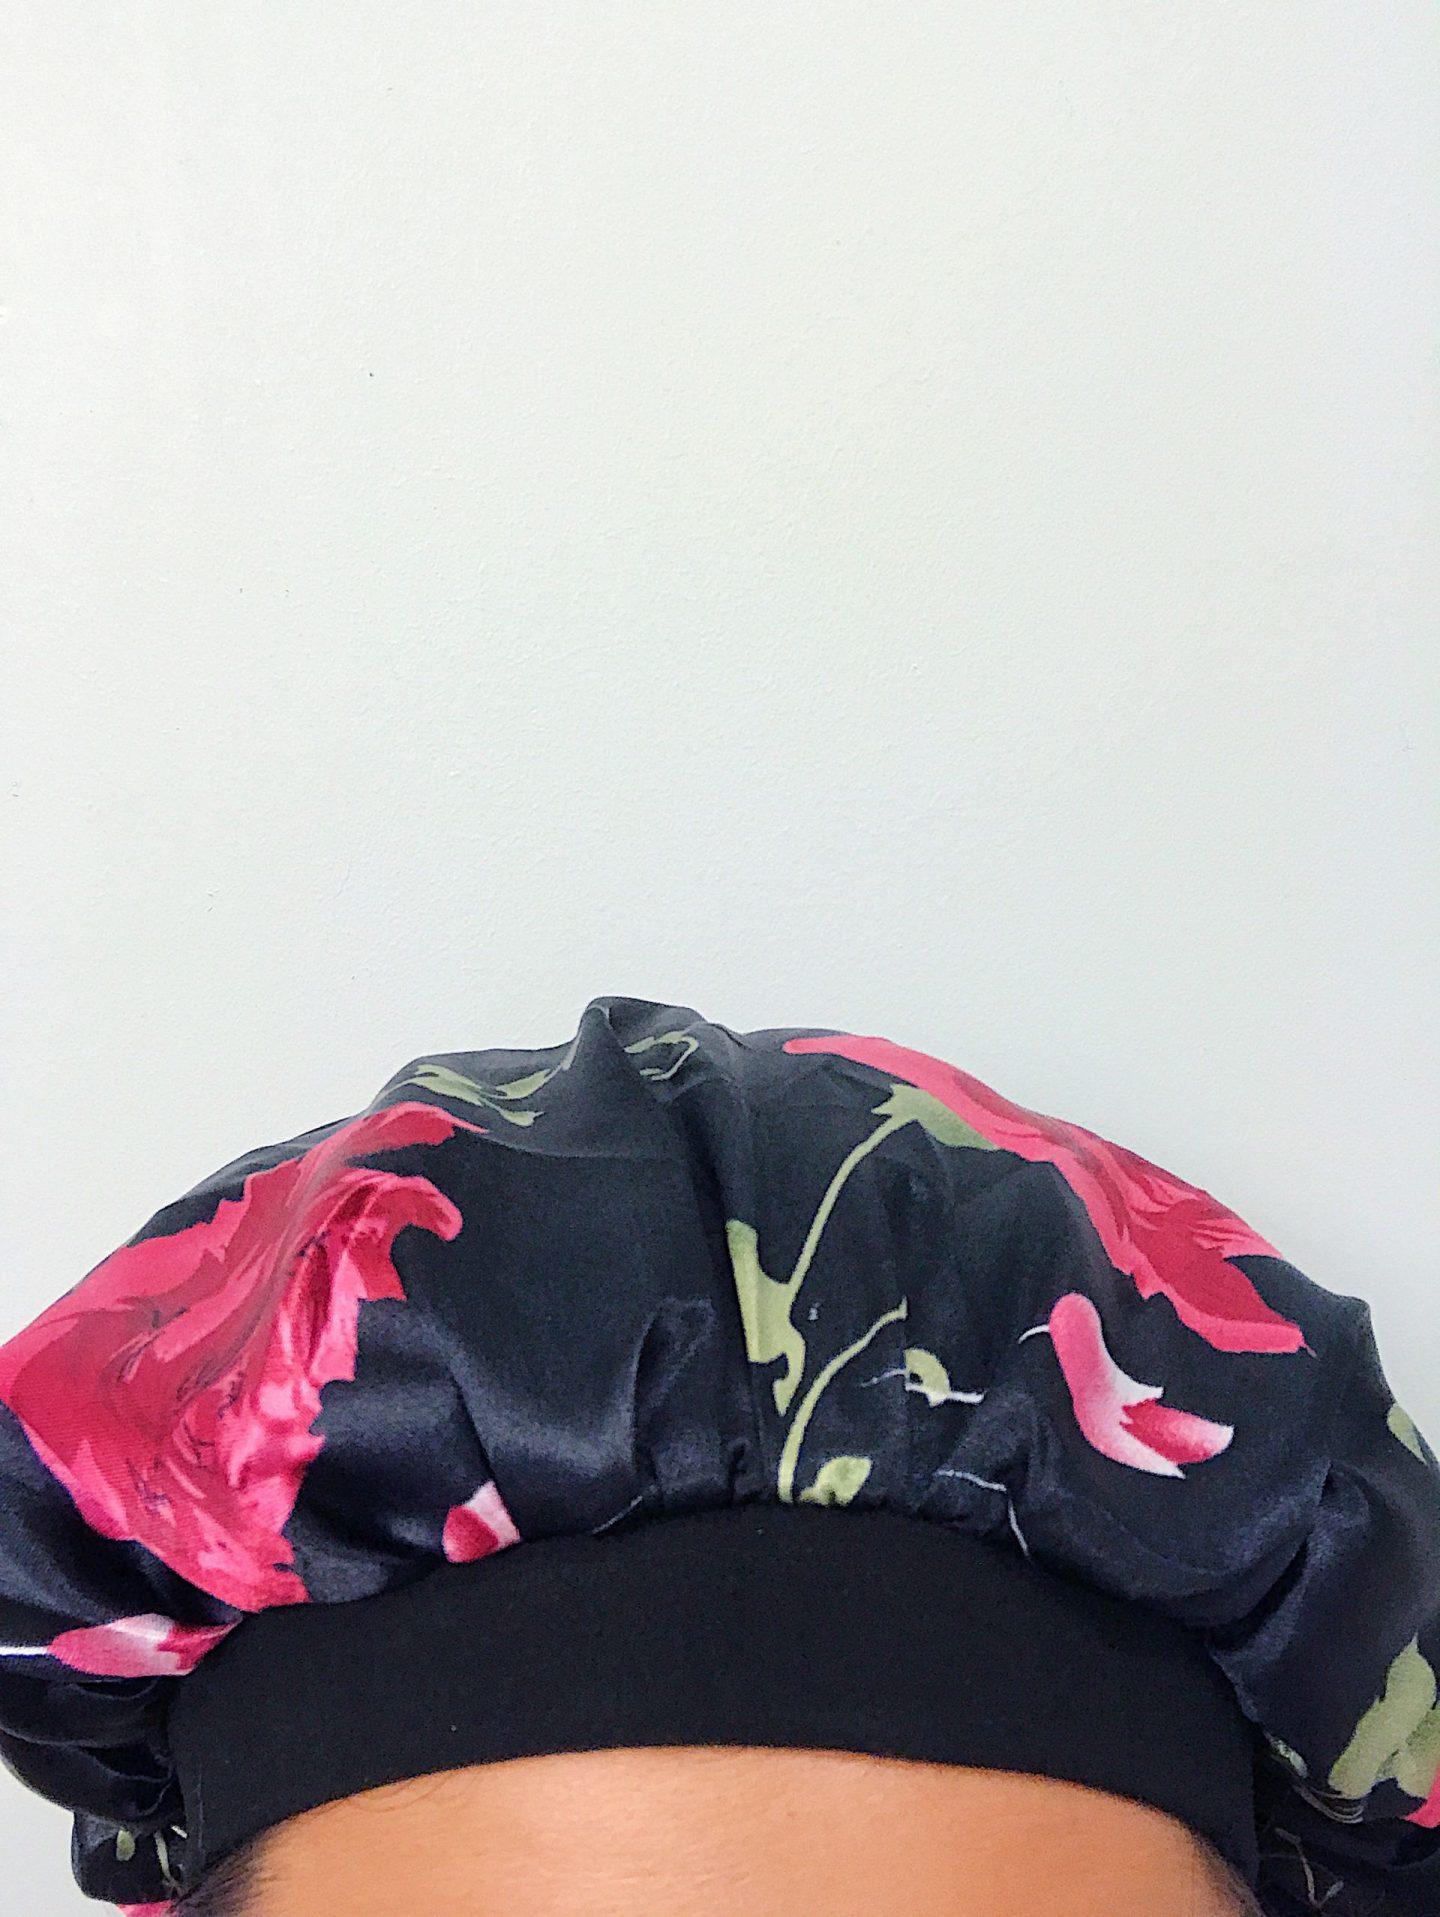 My sleeping bonnet